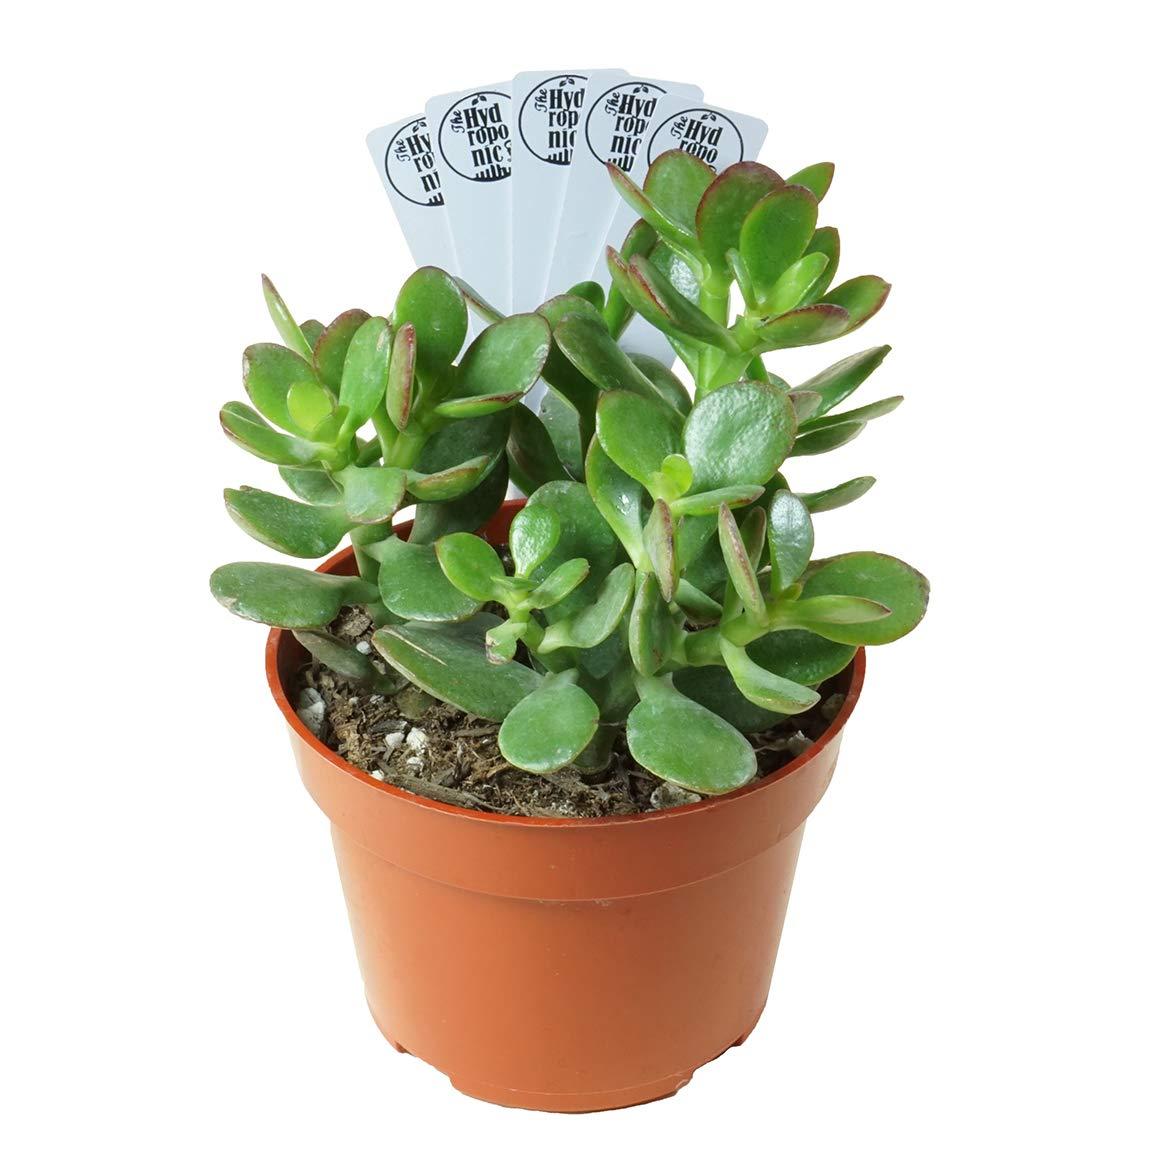 13 Best Indoor Succulents to Grow Now! Jade Plant Crassula Ovuta #Succulents #Garden #Gardening #HousePlants #Decor #HomeDecor #GrowYourOwn #Affordable #DIY #BudgetFriendly #EasyToGrow #EasyToMaintain #GrowItYourself